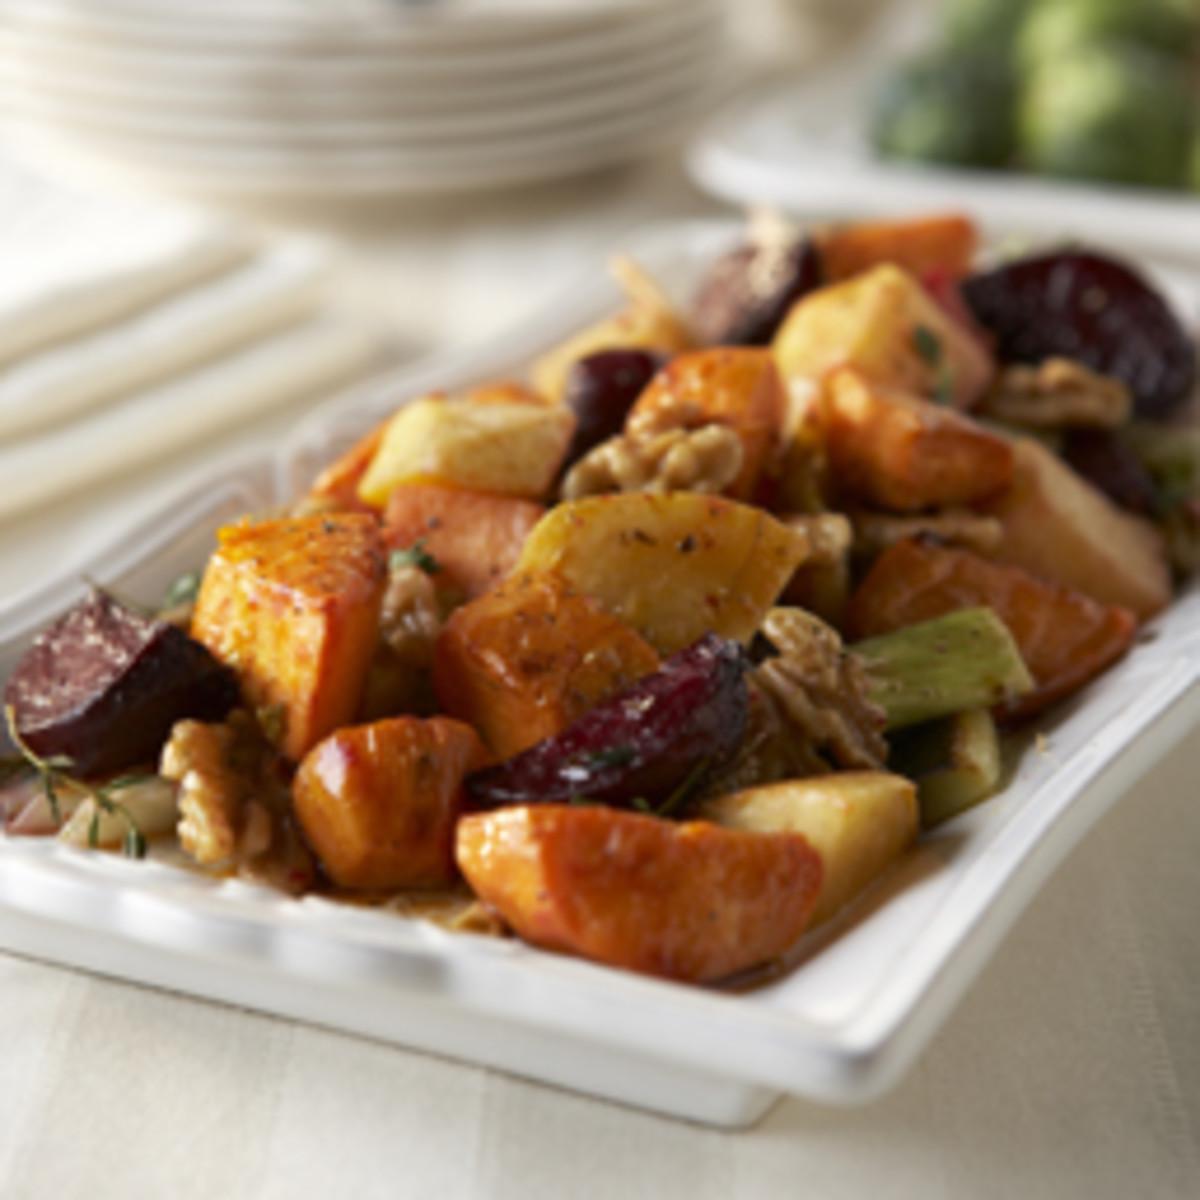 Roasted Vegetables with Walnut Vinaigrette